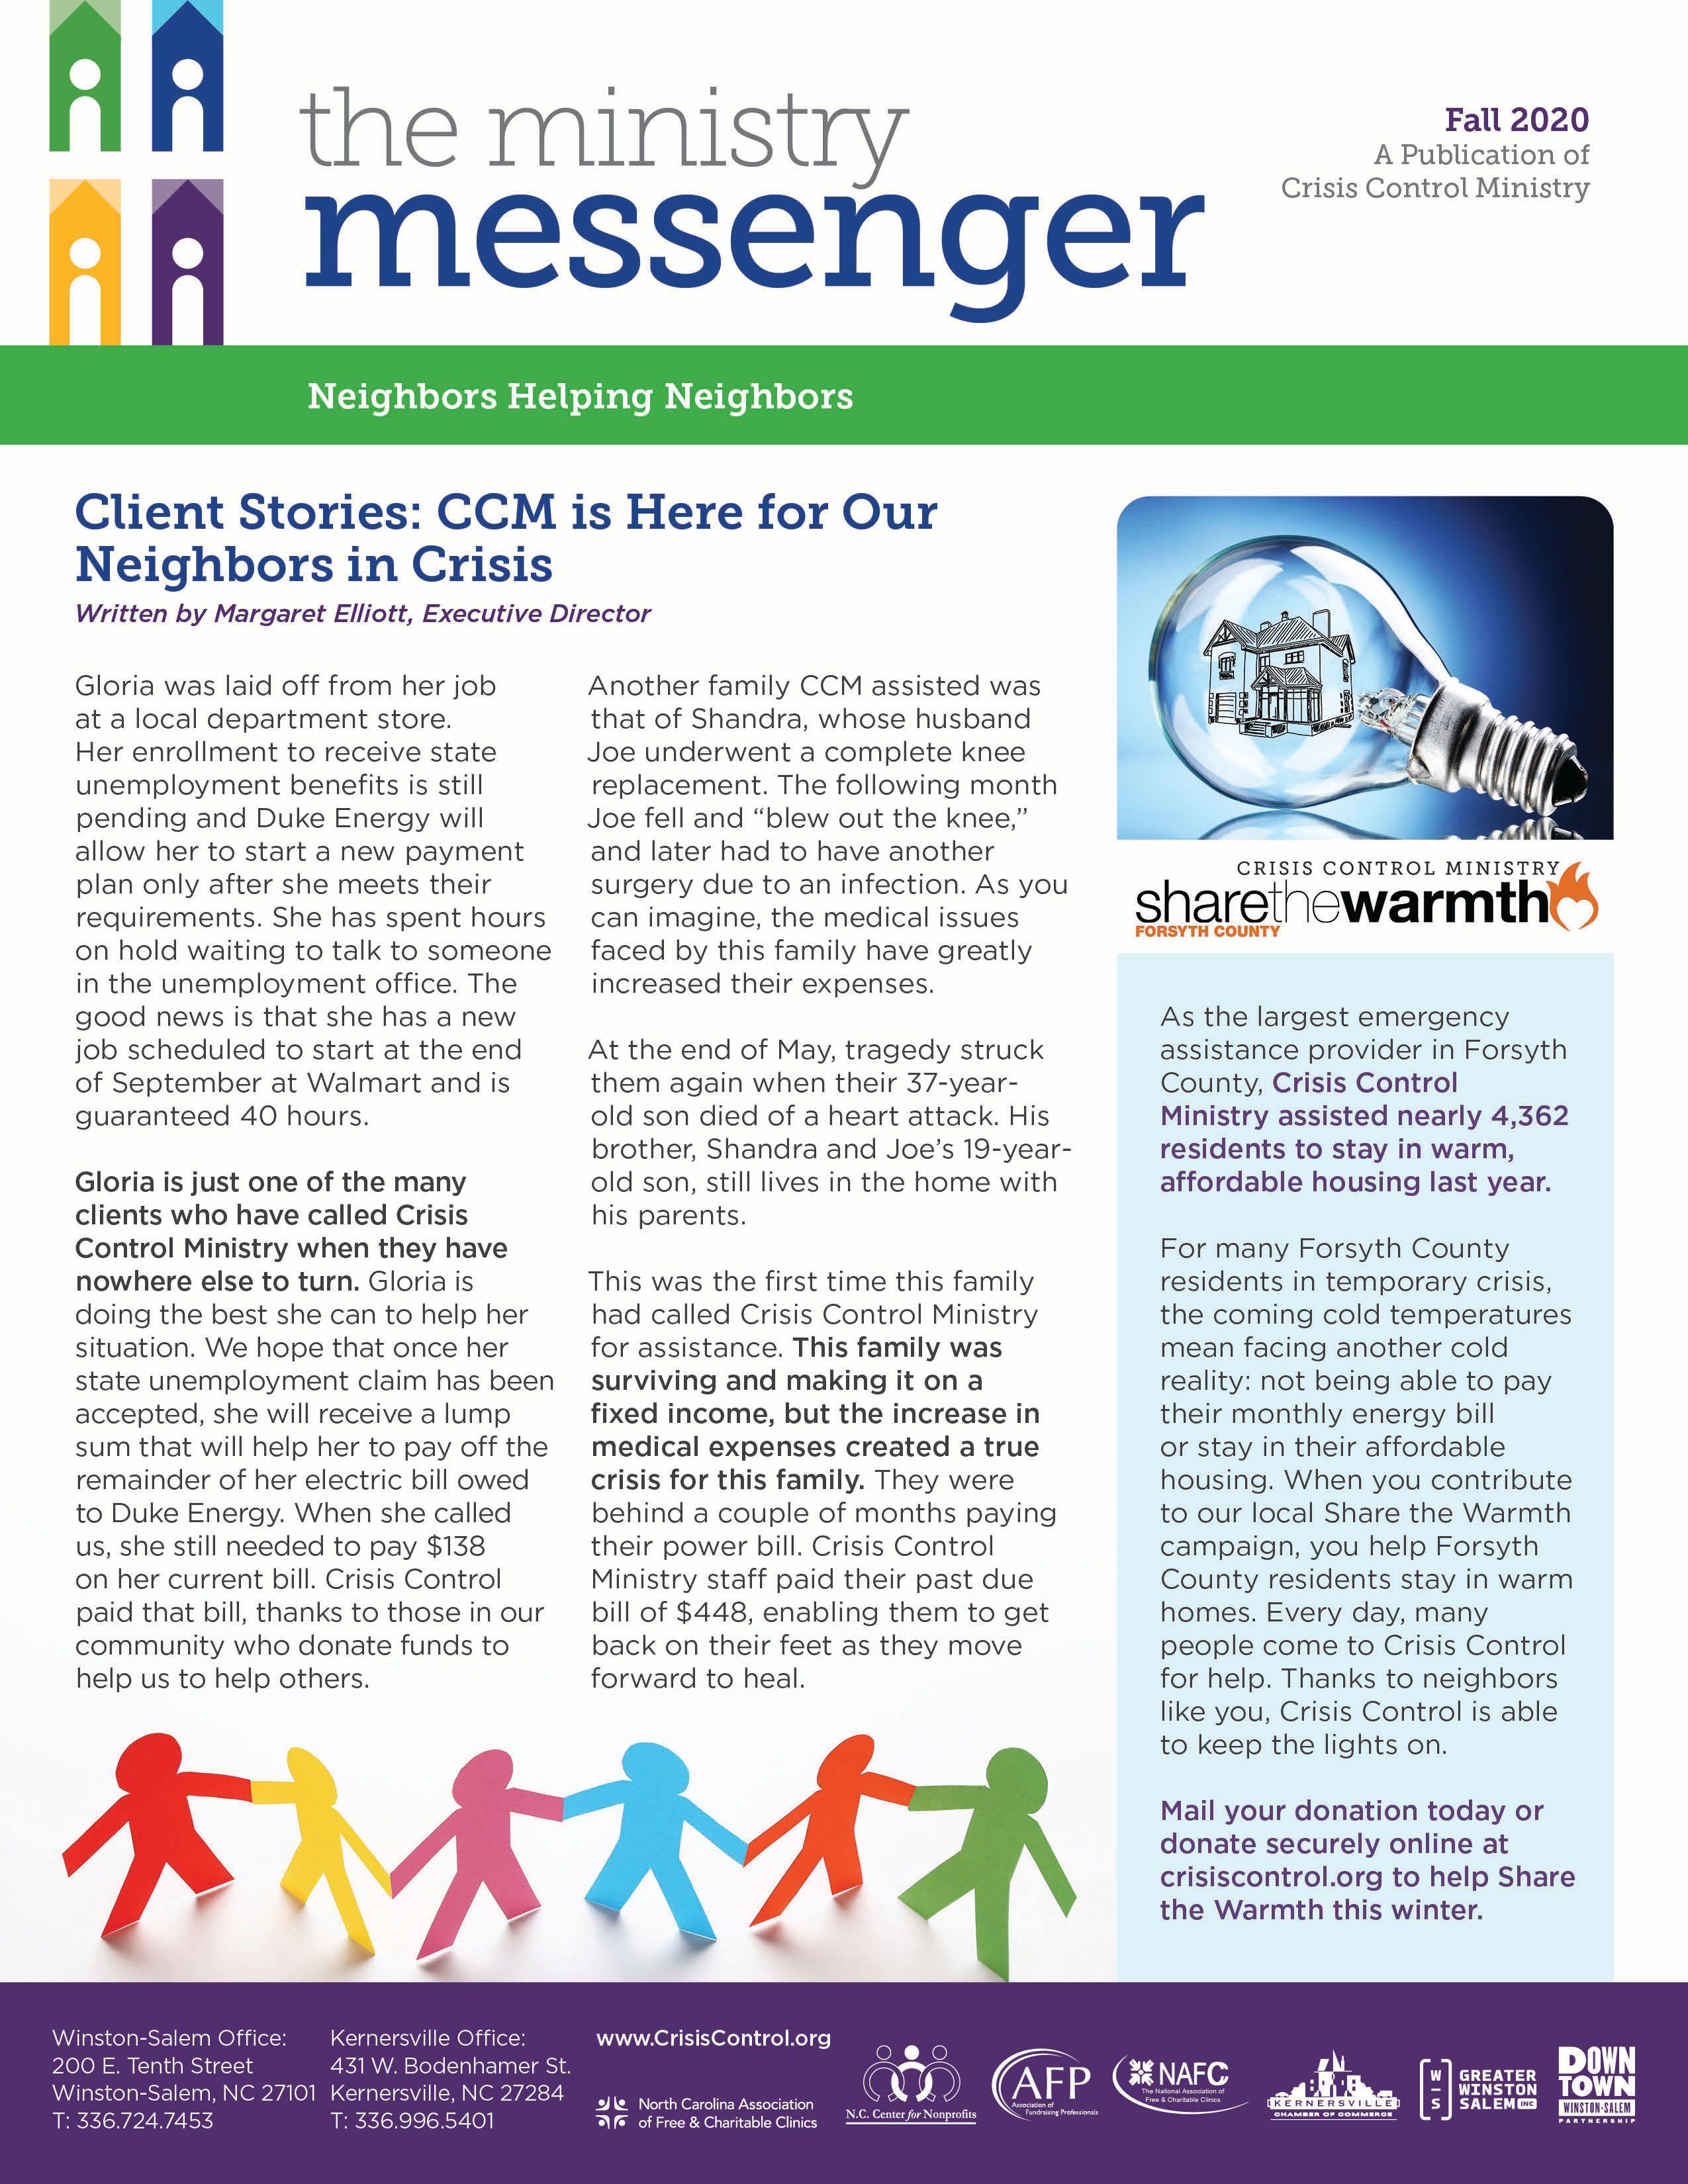 Fall 2020 Ministry Messenger